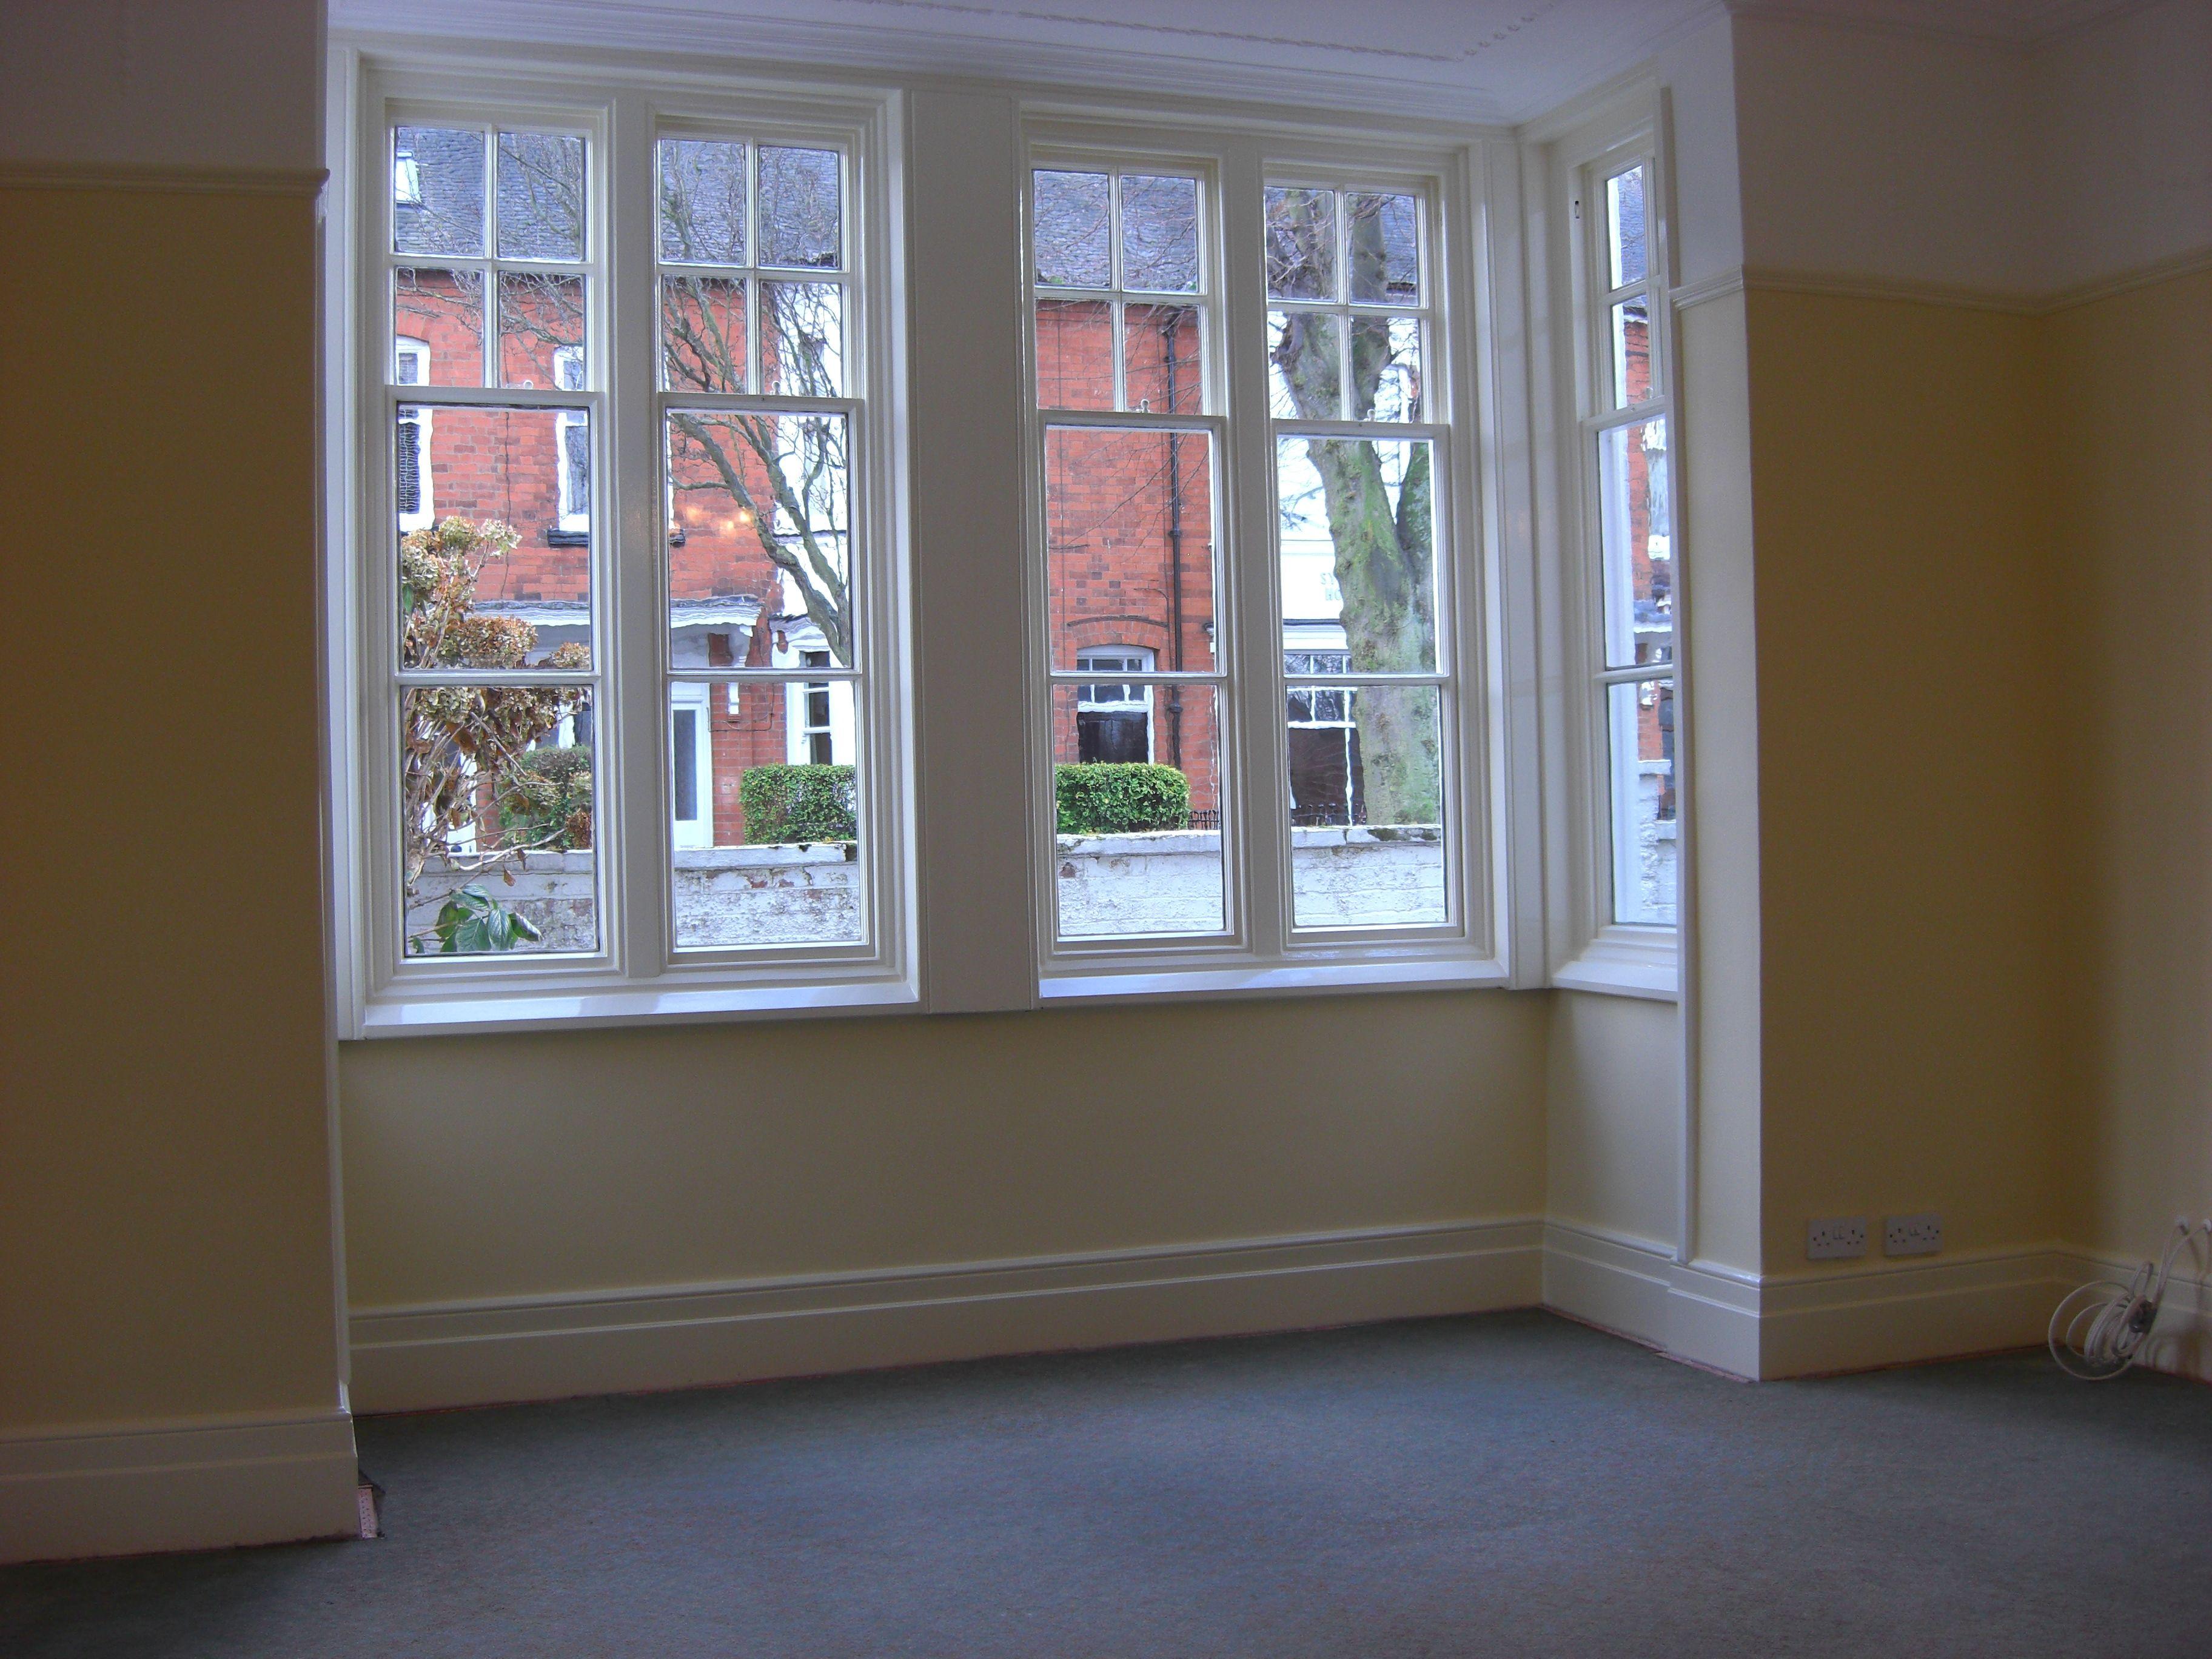 Square Bay Sash Window With Images Bay Window Design Sash Windows Bay Window